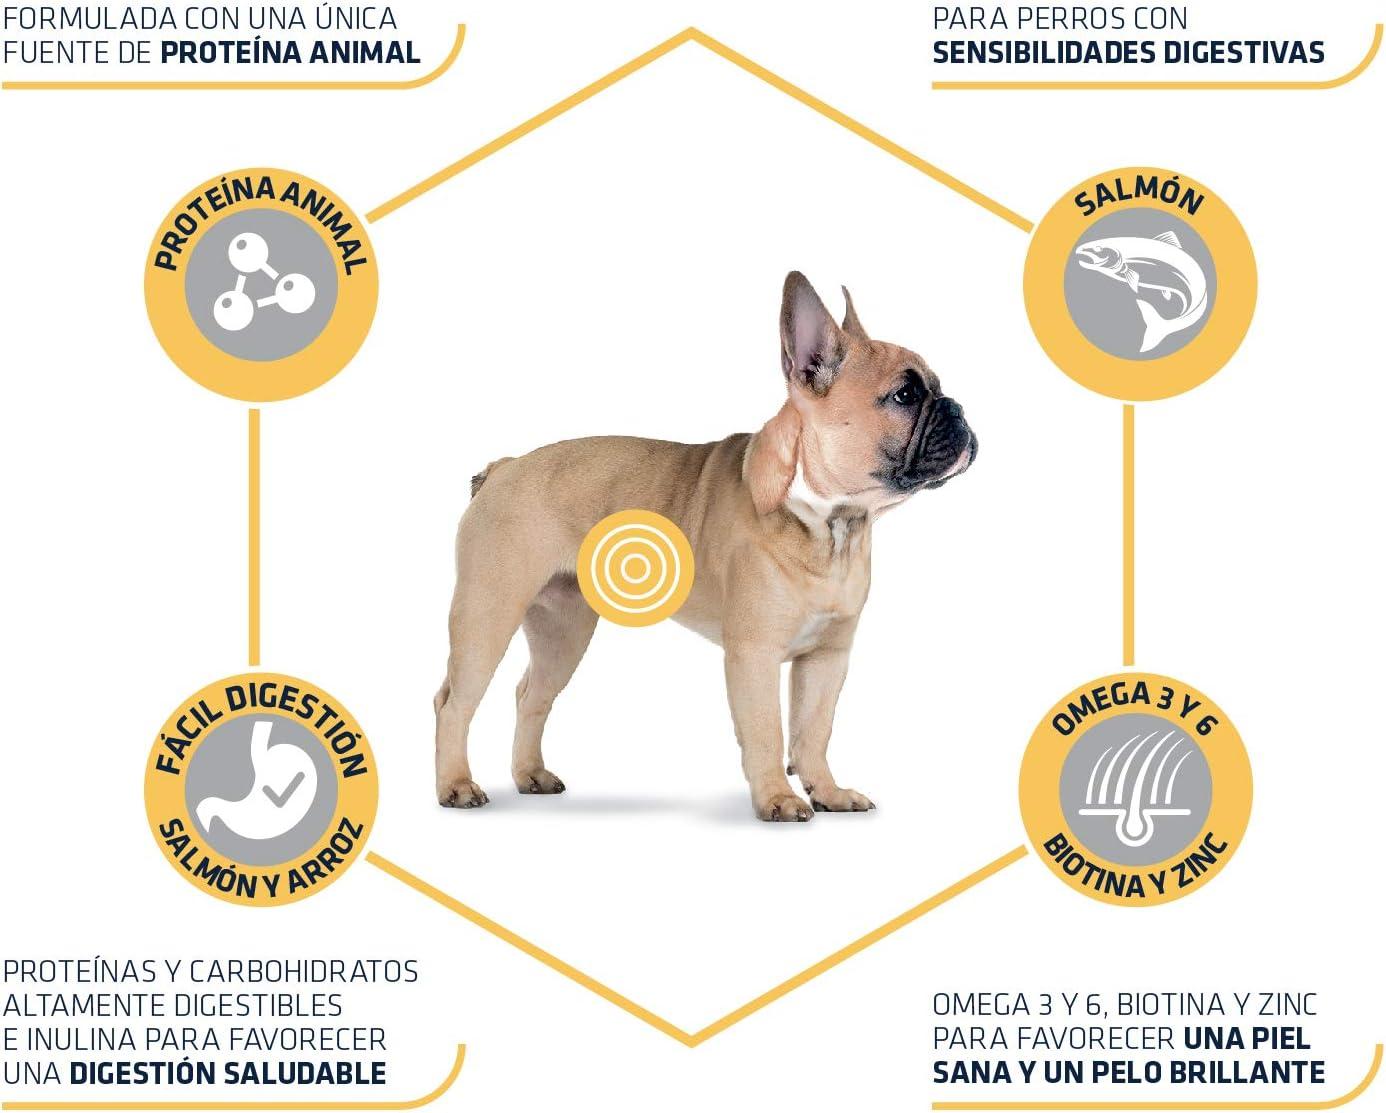 ADVANCE Sensitive Mini - Pienso Para Perros Adultos Con Sensibilidades Digestivas De Razas Pequeñas Con Salmón - 7,5 kg